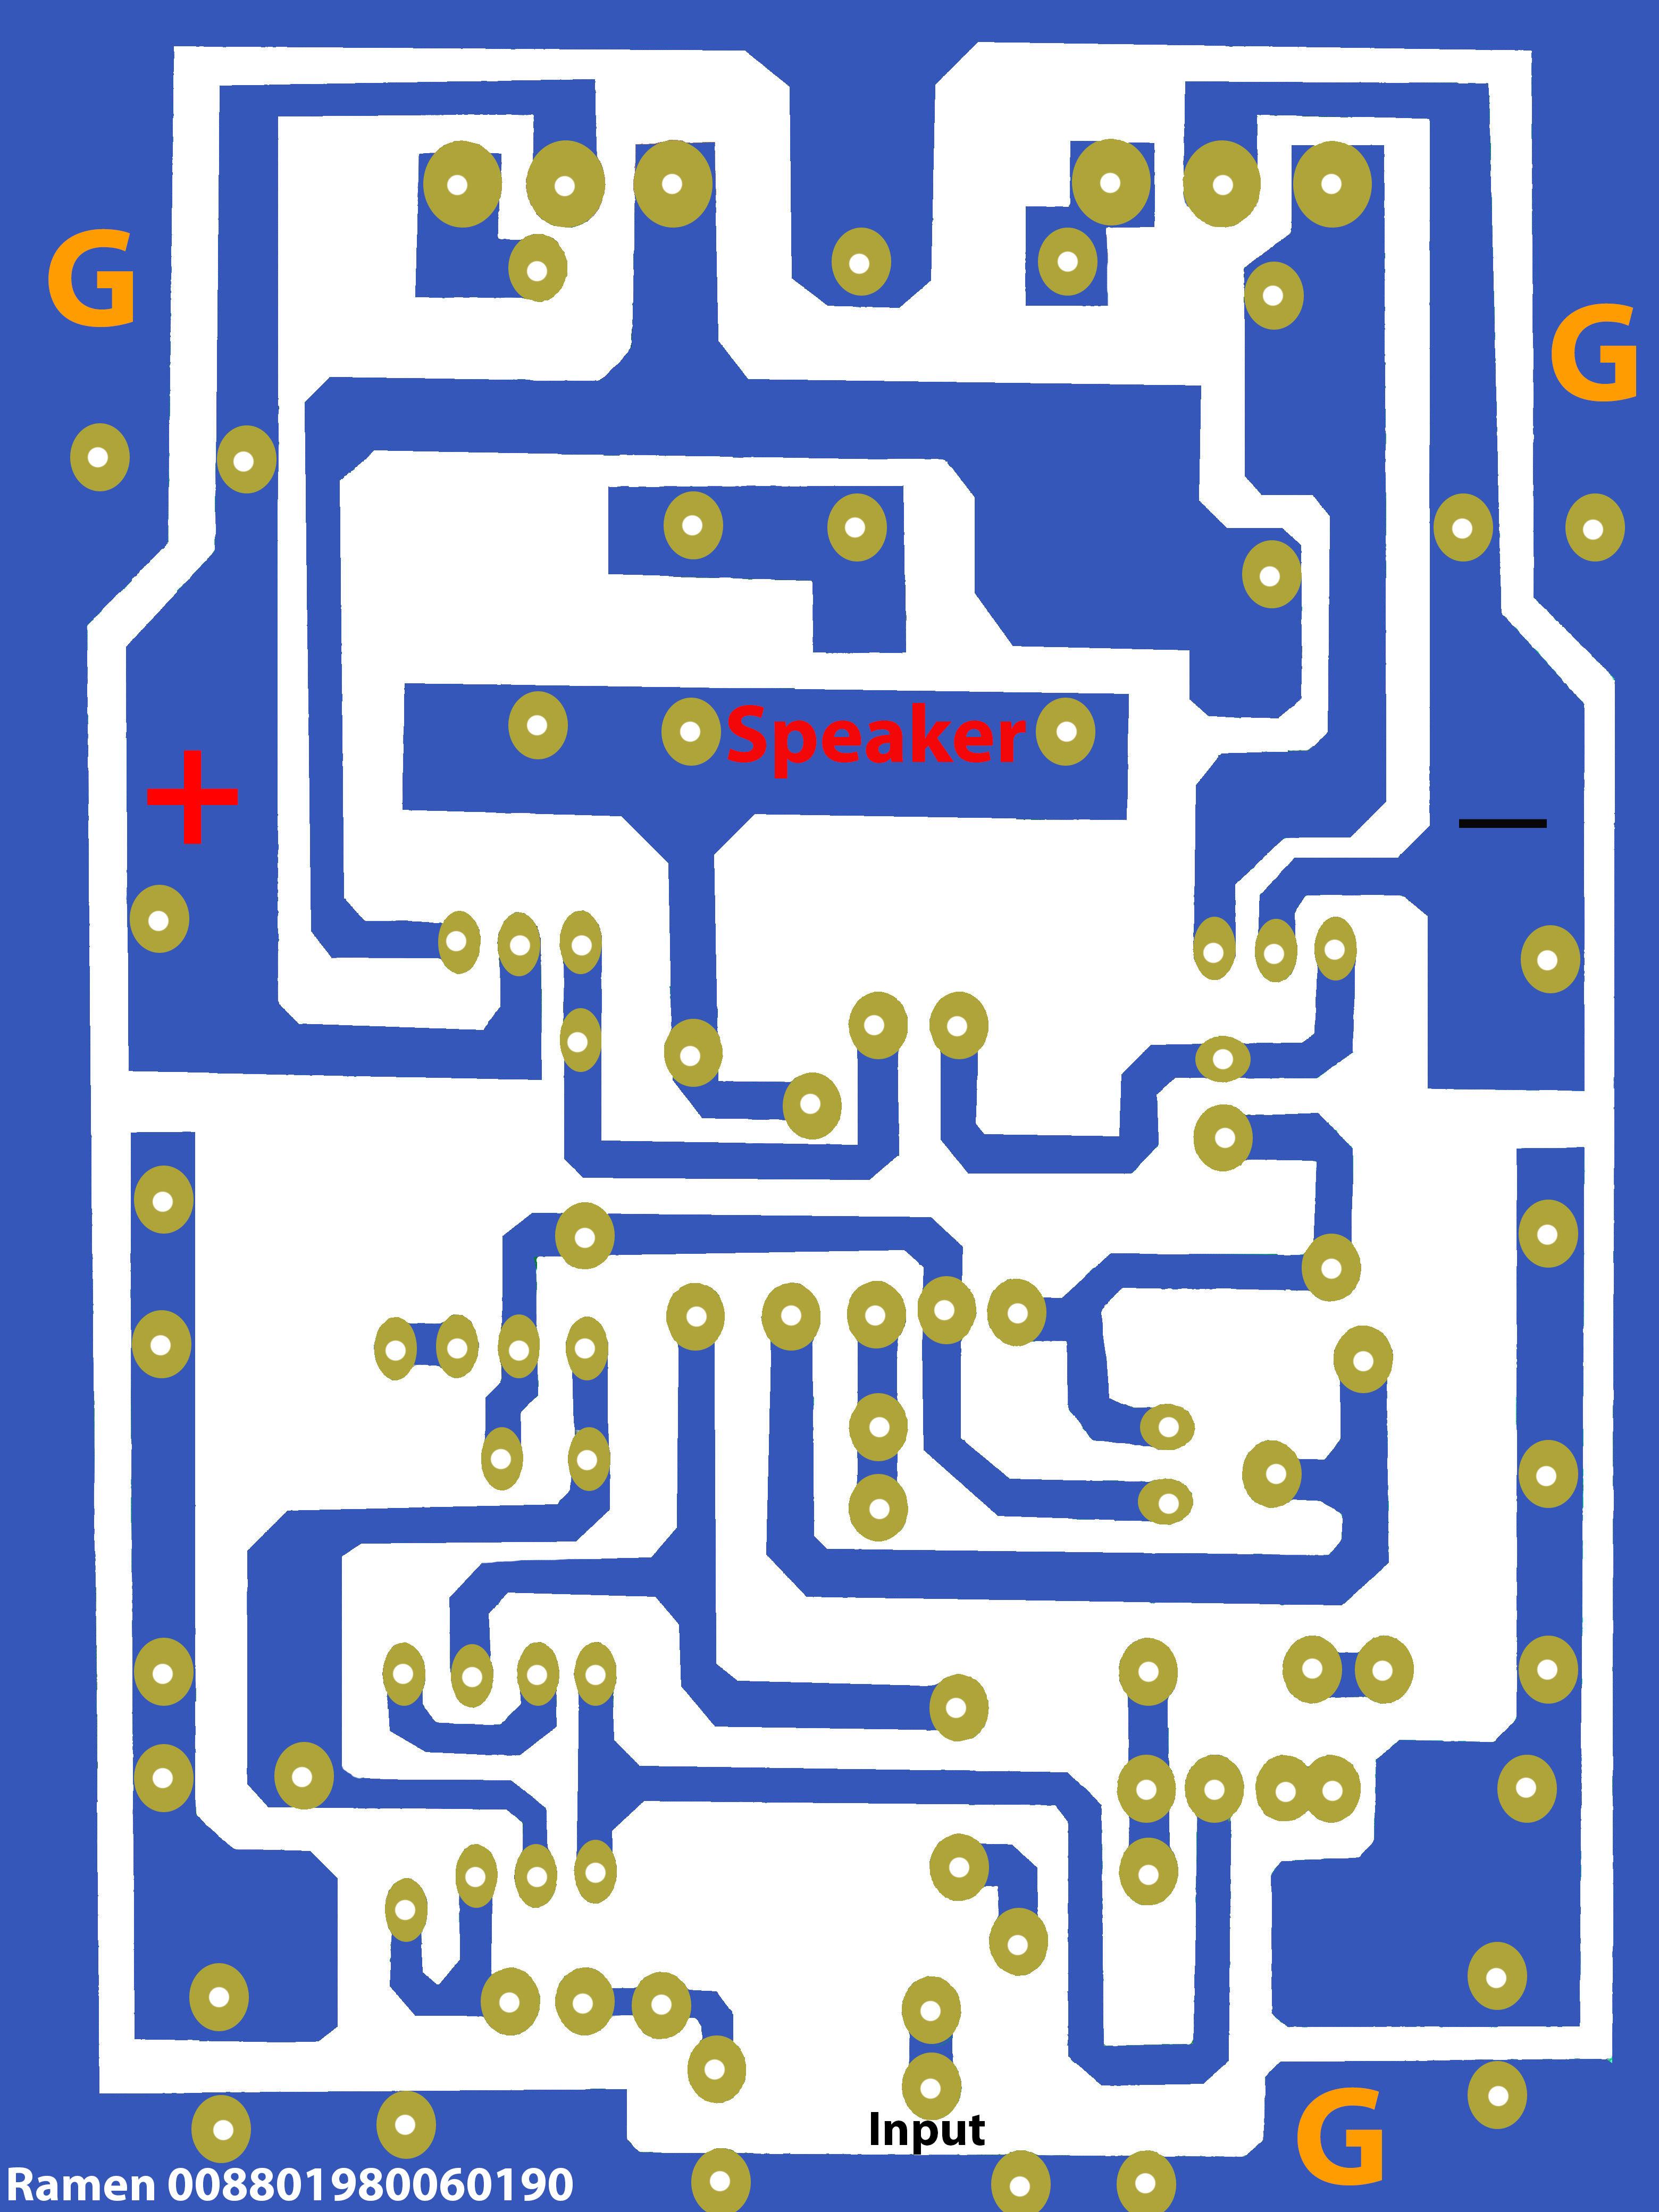 2sc5200 2sa1943 amplifier circuit diagram pcb electronics help care Stereo Audio Amplifier Circuit Diagram 2sc5200 2sa1943 amplifier circuit diagram pcb